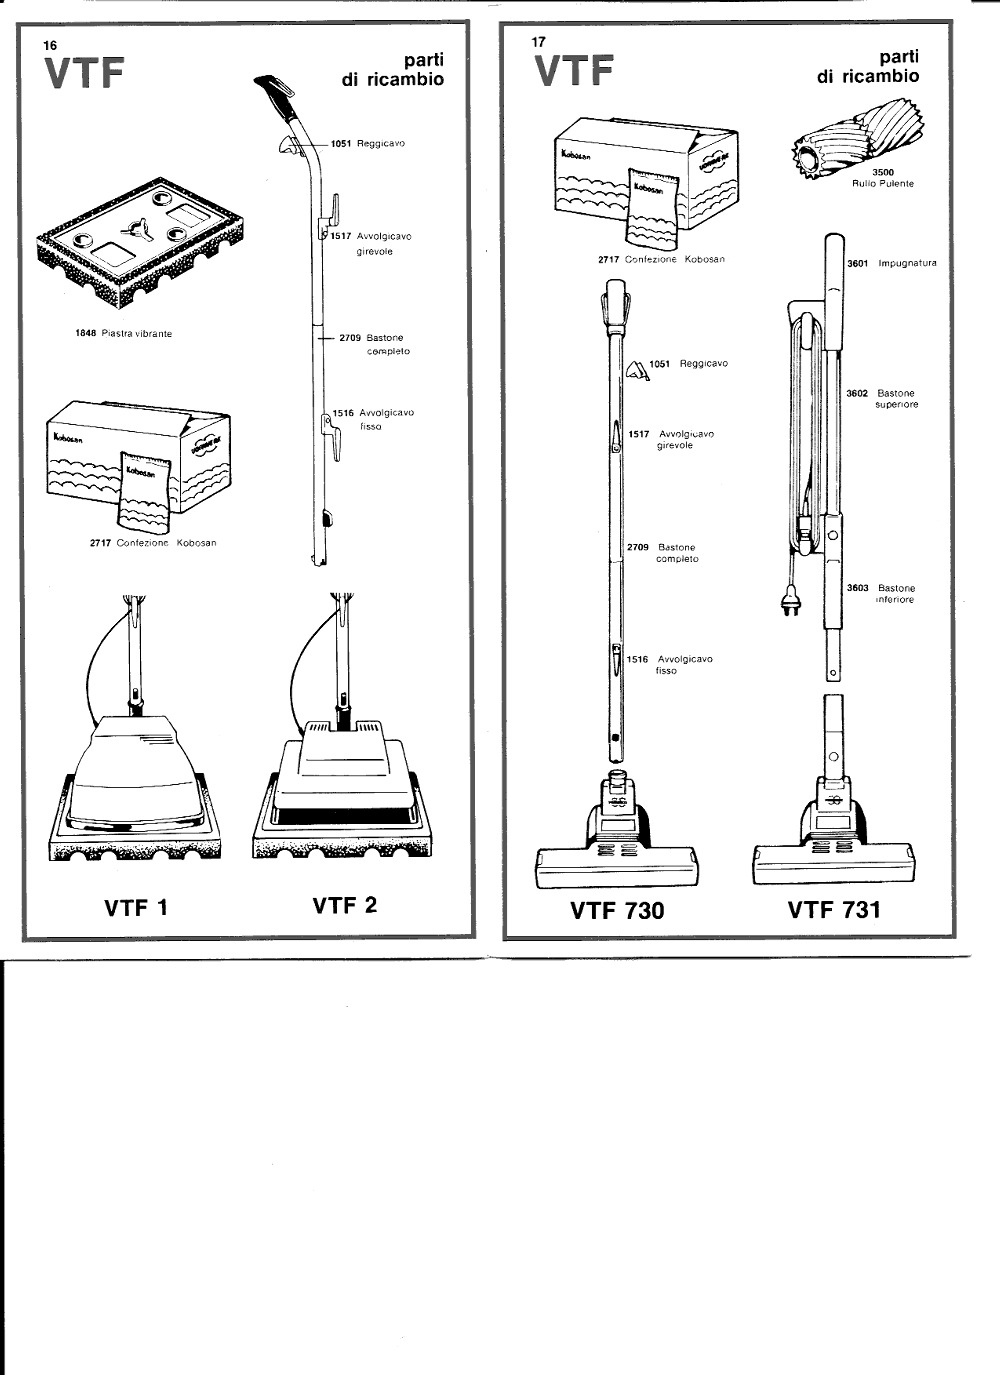 Vorwerk Folletto Spare Parts Manual #12